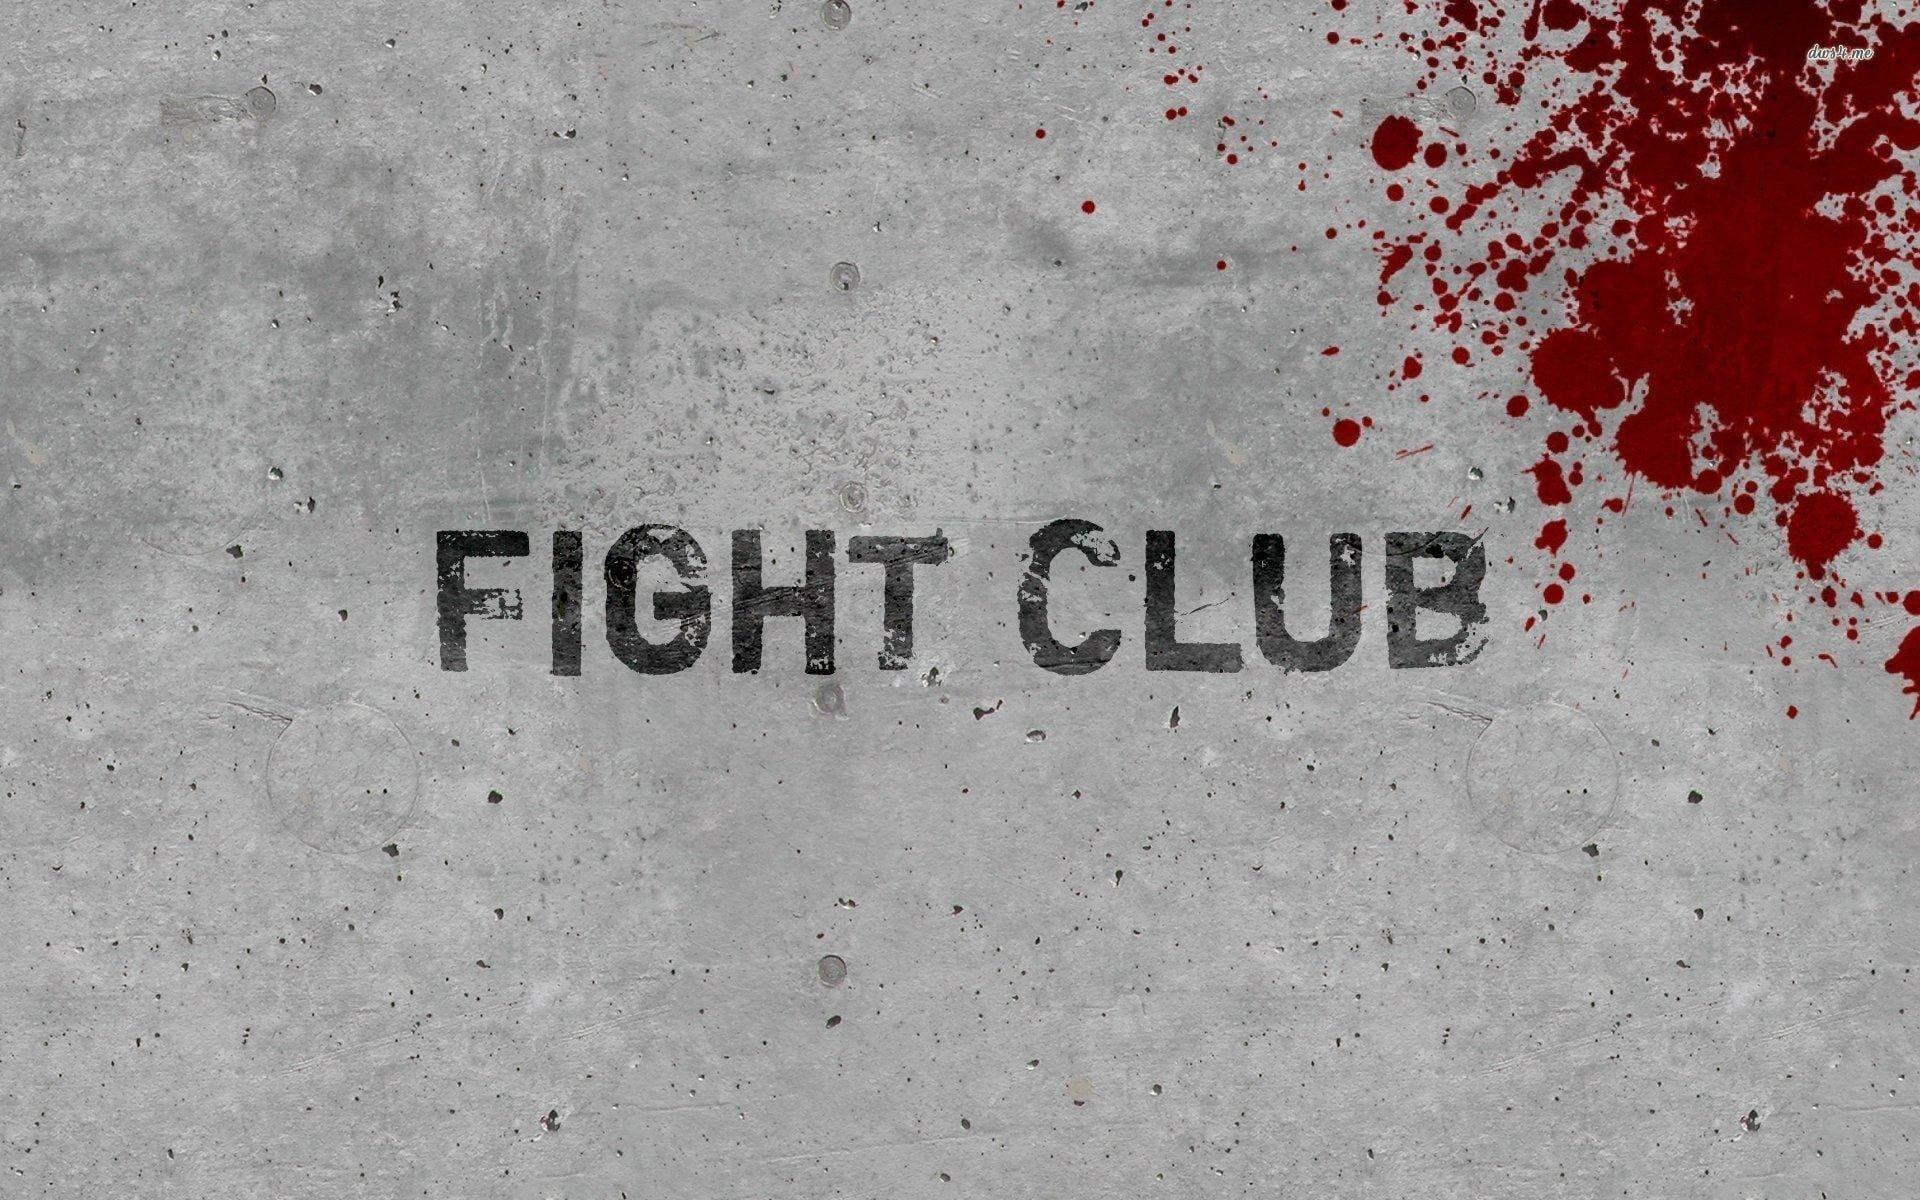 Pin On Asd Fight club desktop wallpaper hd